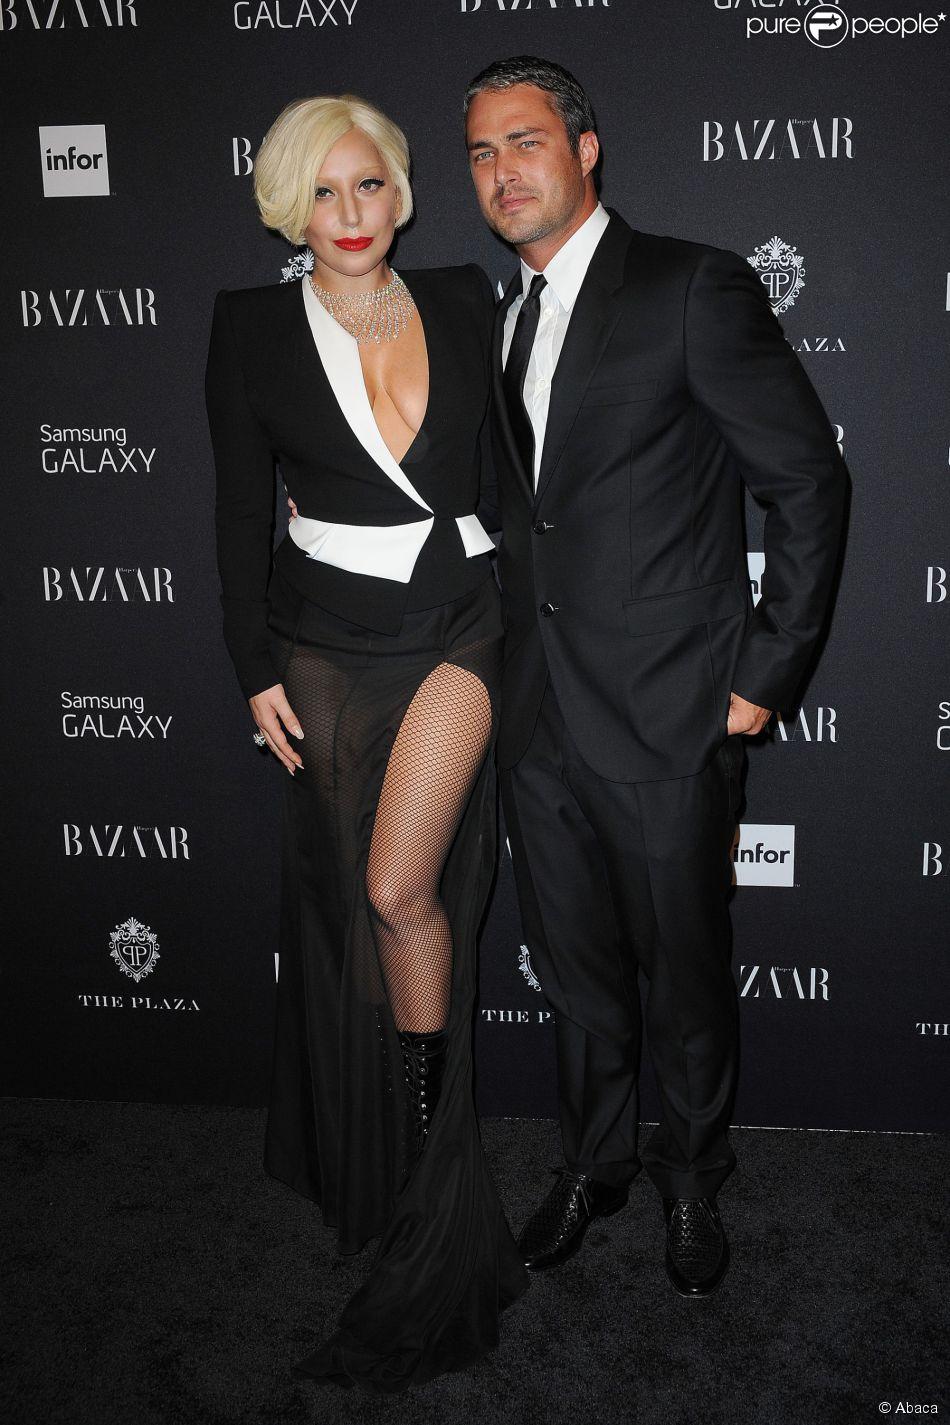 Lady Gaga et Taylor Kinney à New York, le 5 septembre 2014.